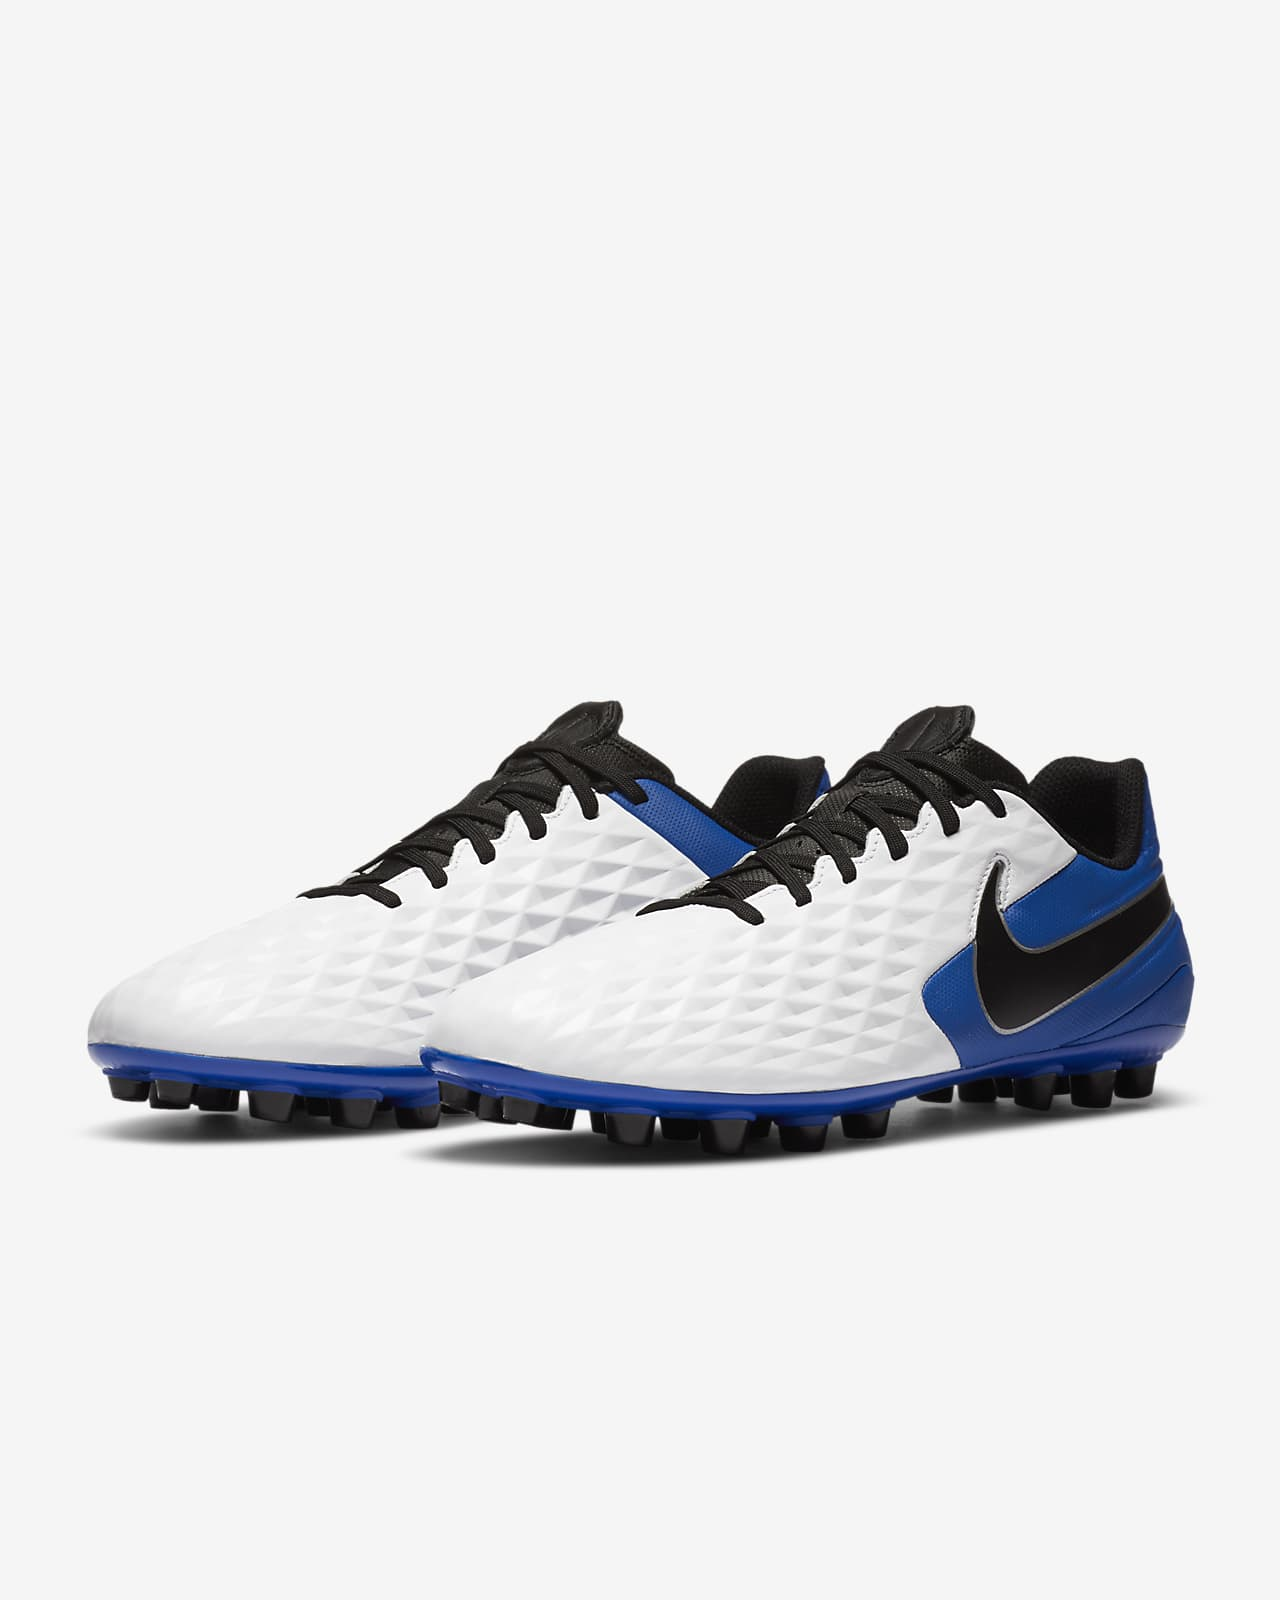 corona Golpeteo seguramente  Nike Tiempo Legend 8 Academy AG Artificial-Grass Football Boot. Nike LU